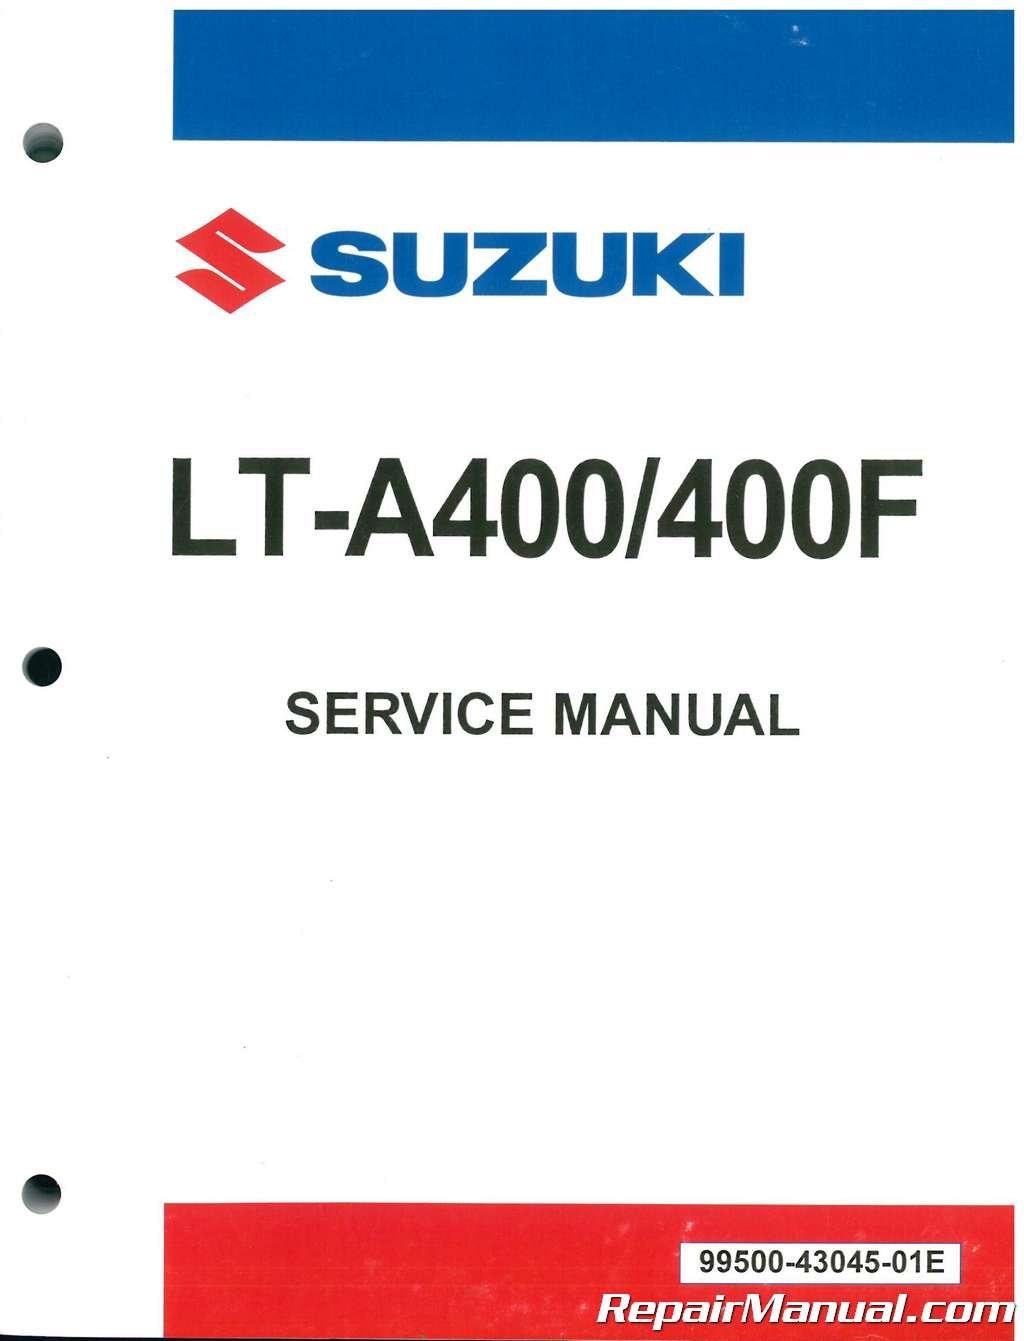 99500-43045-01E 2002-2007 Suzuki LT-A400 400F Eiger Auto ATV Workshop Manual:  Manufacturer: Amazon.com: Books